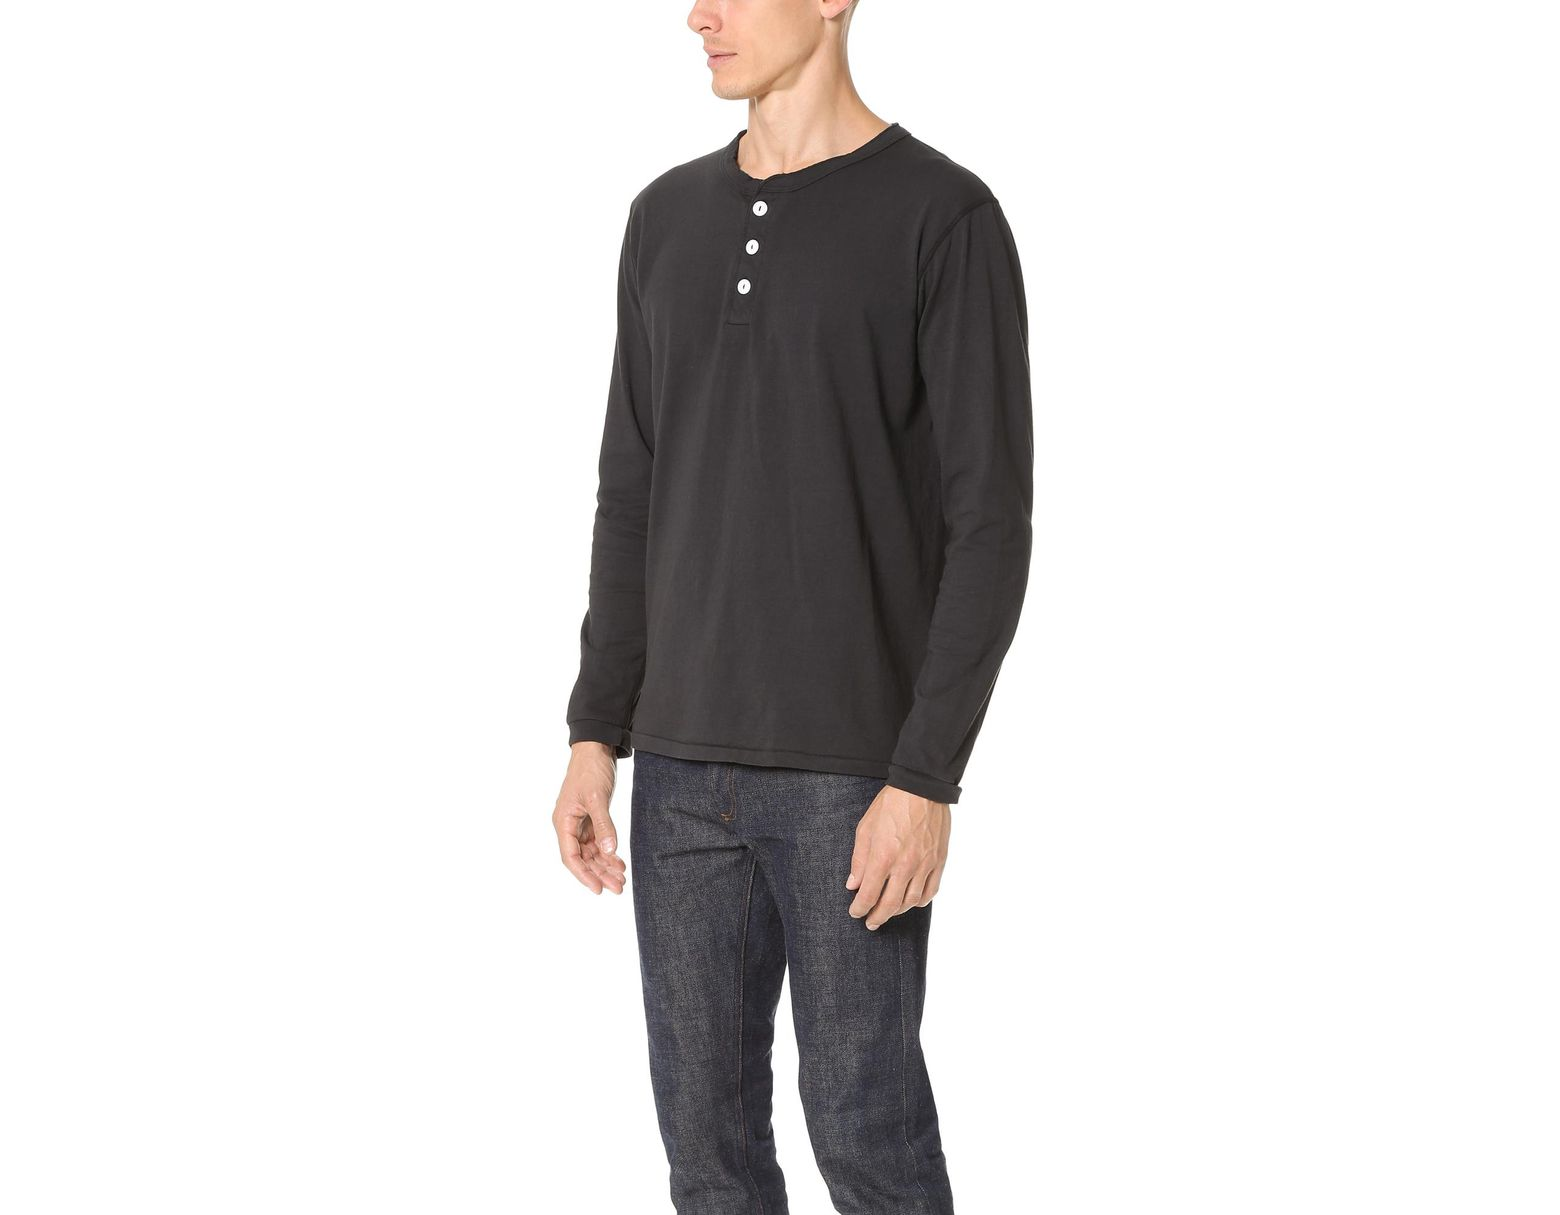 ae7a419a77 Velva Sheen Long Sleeve Henley in Black for Men - Lyst